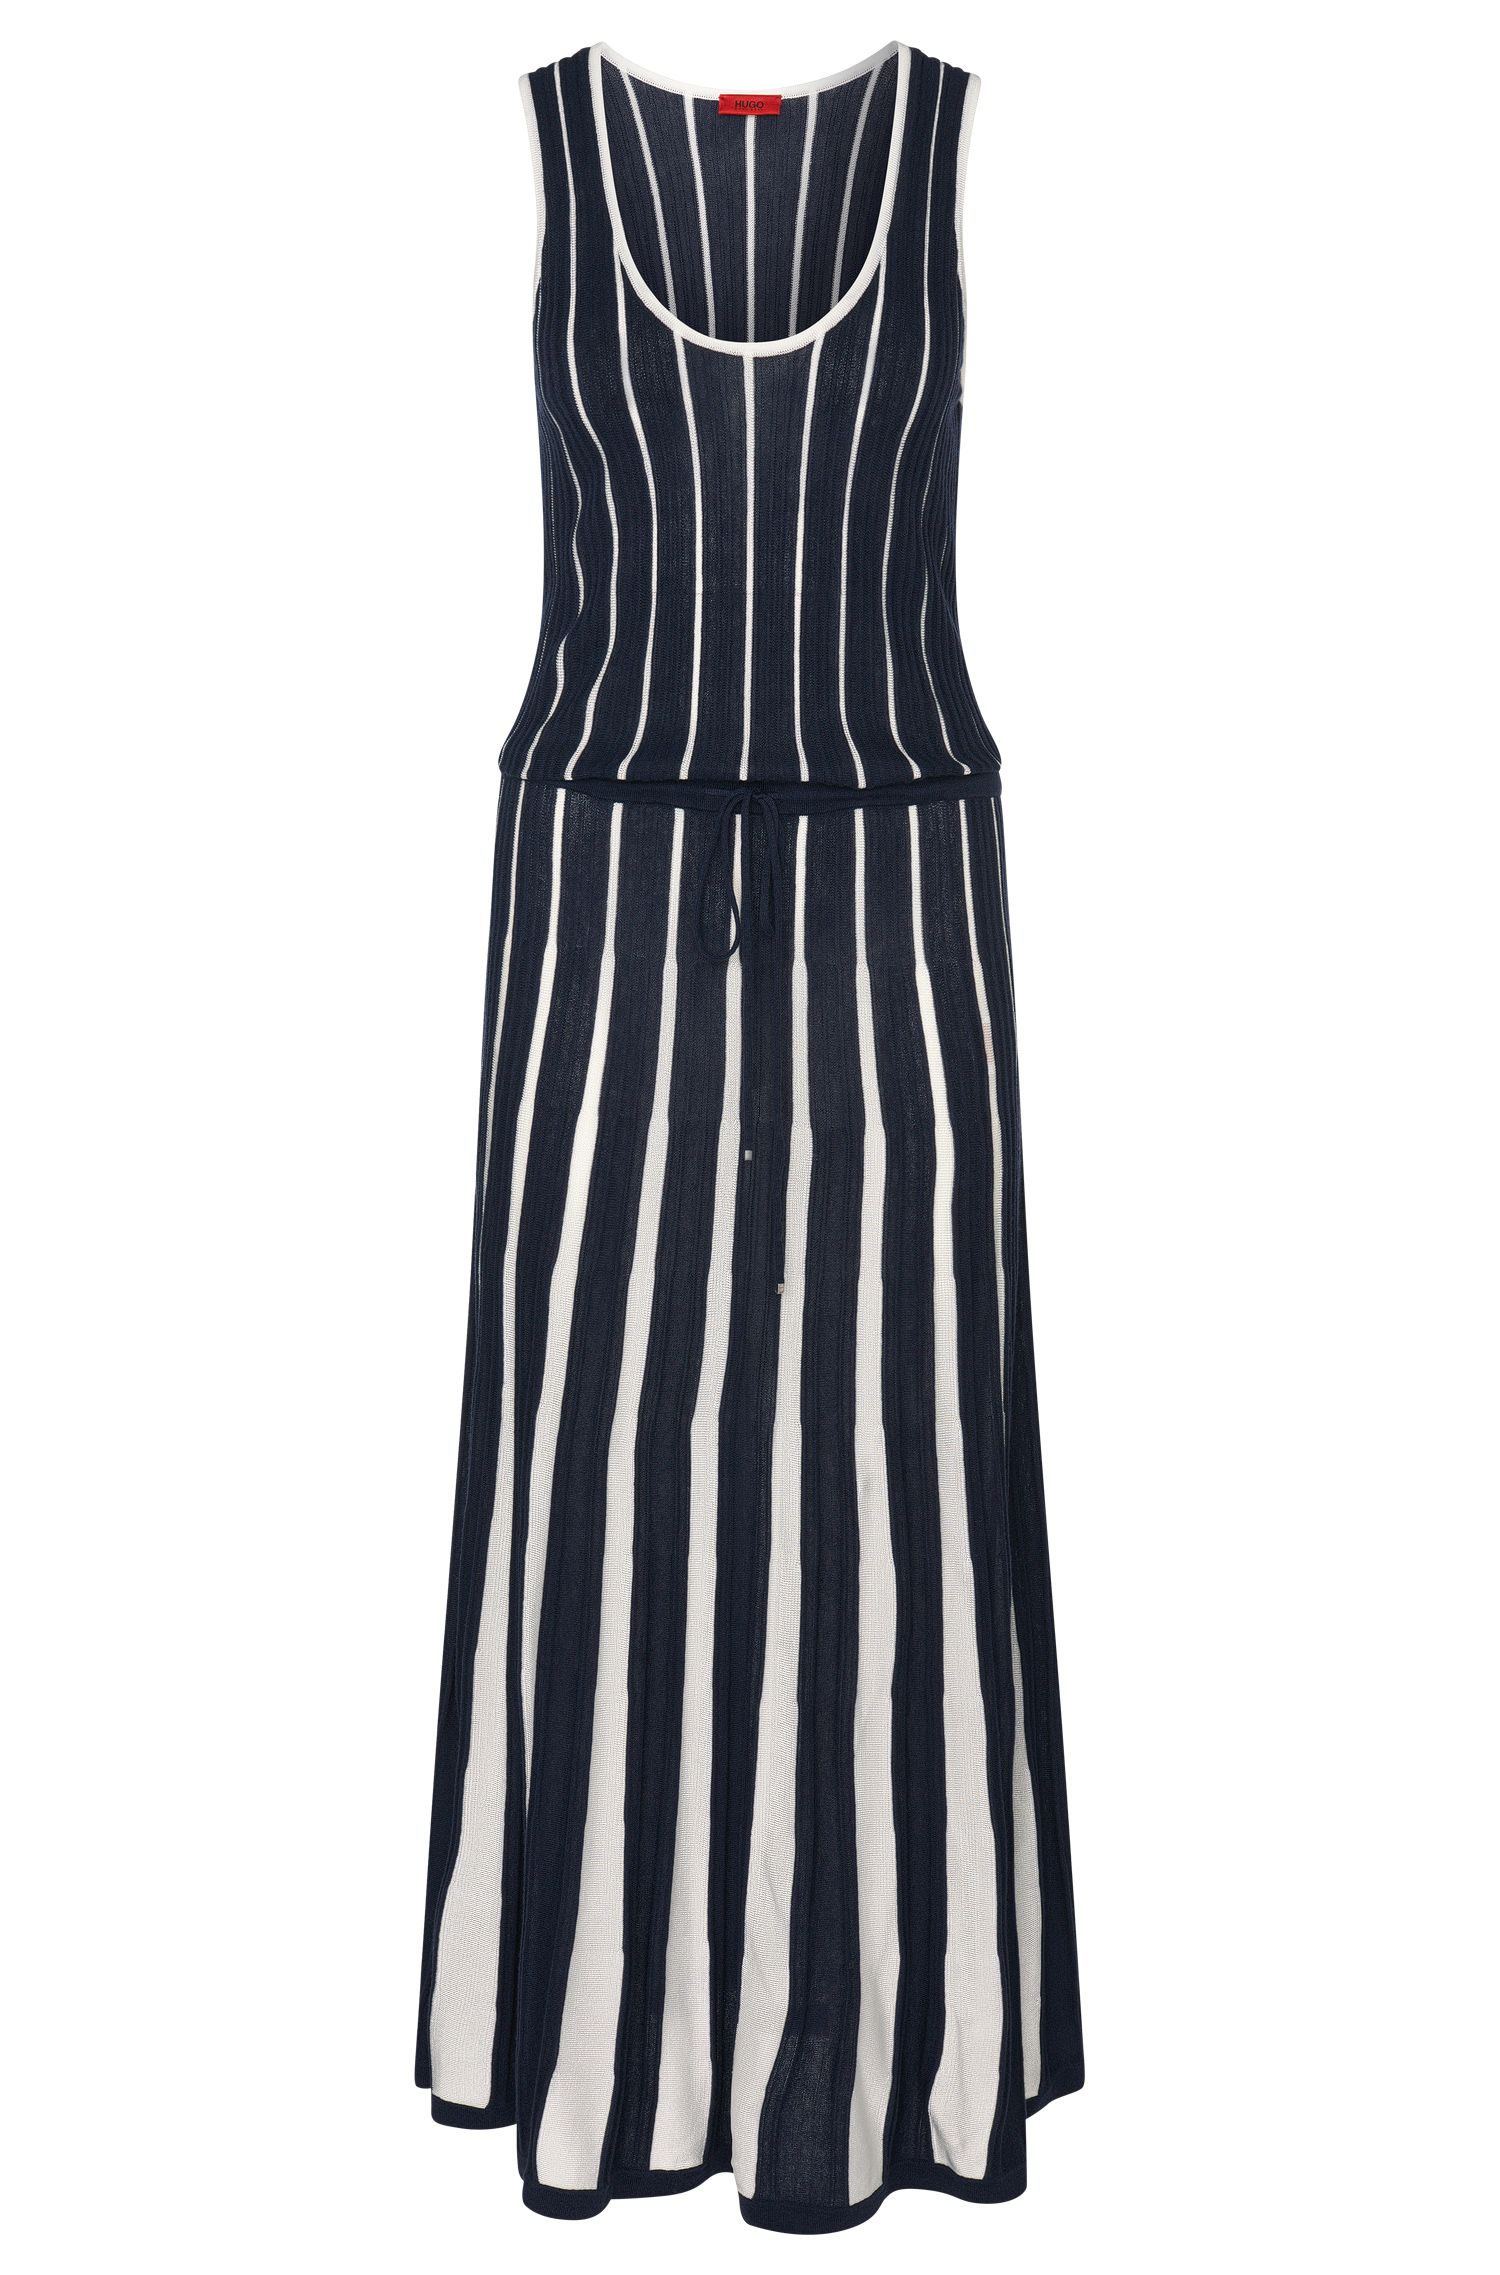 Silk Cotton Cashmere Blend Knit Dress   Stephora